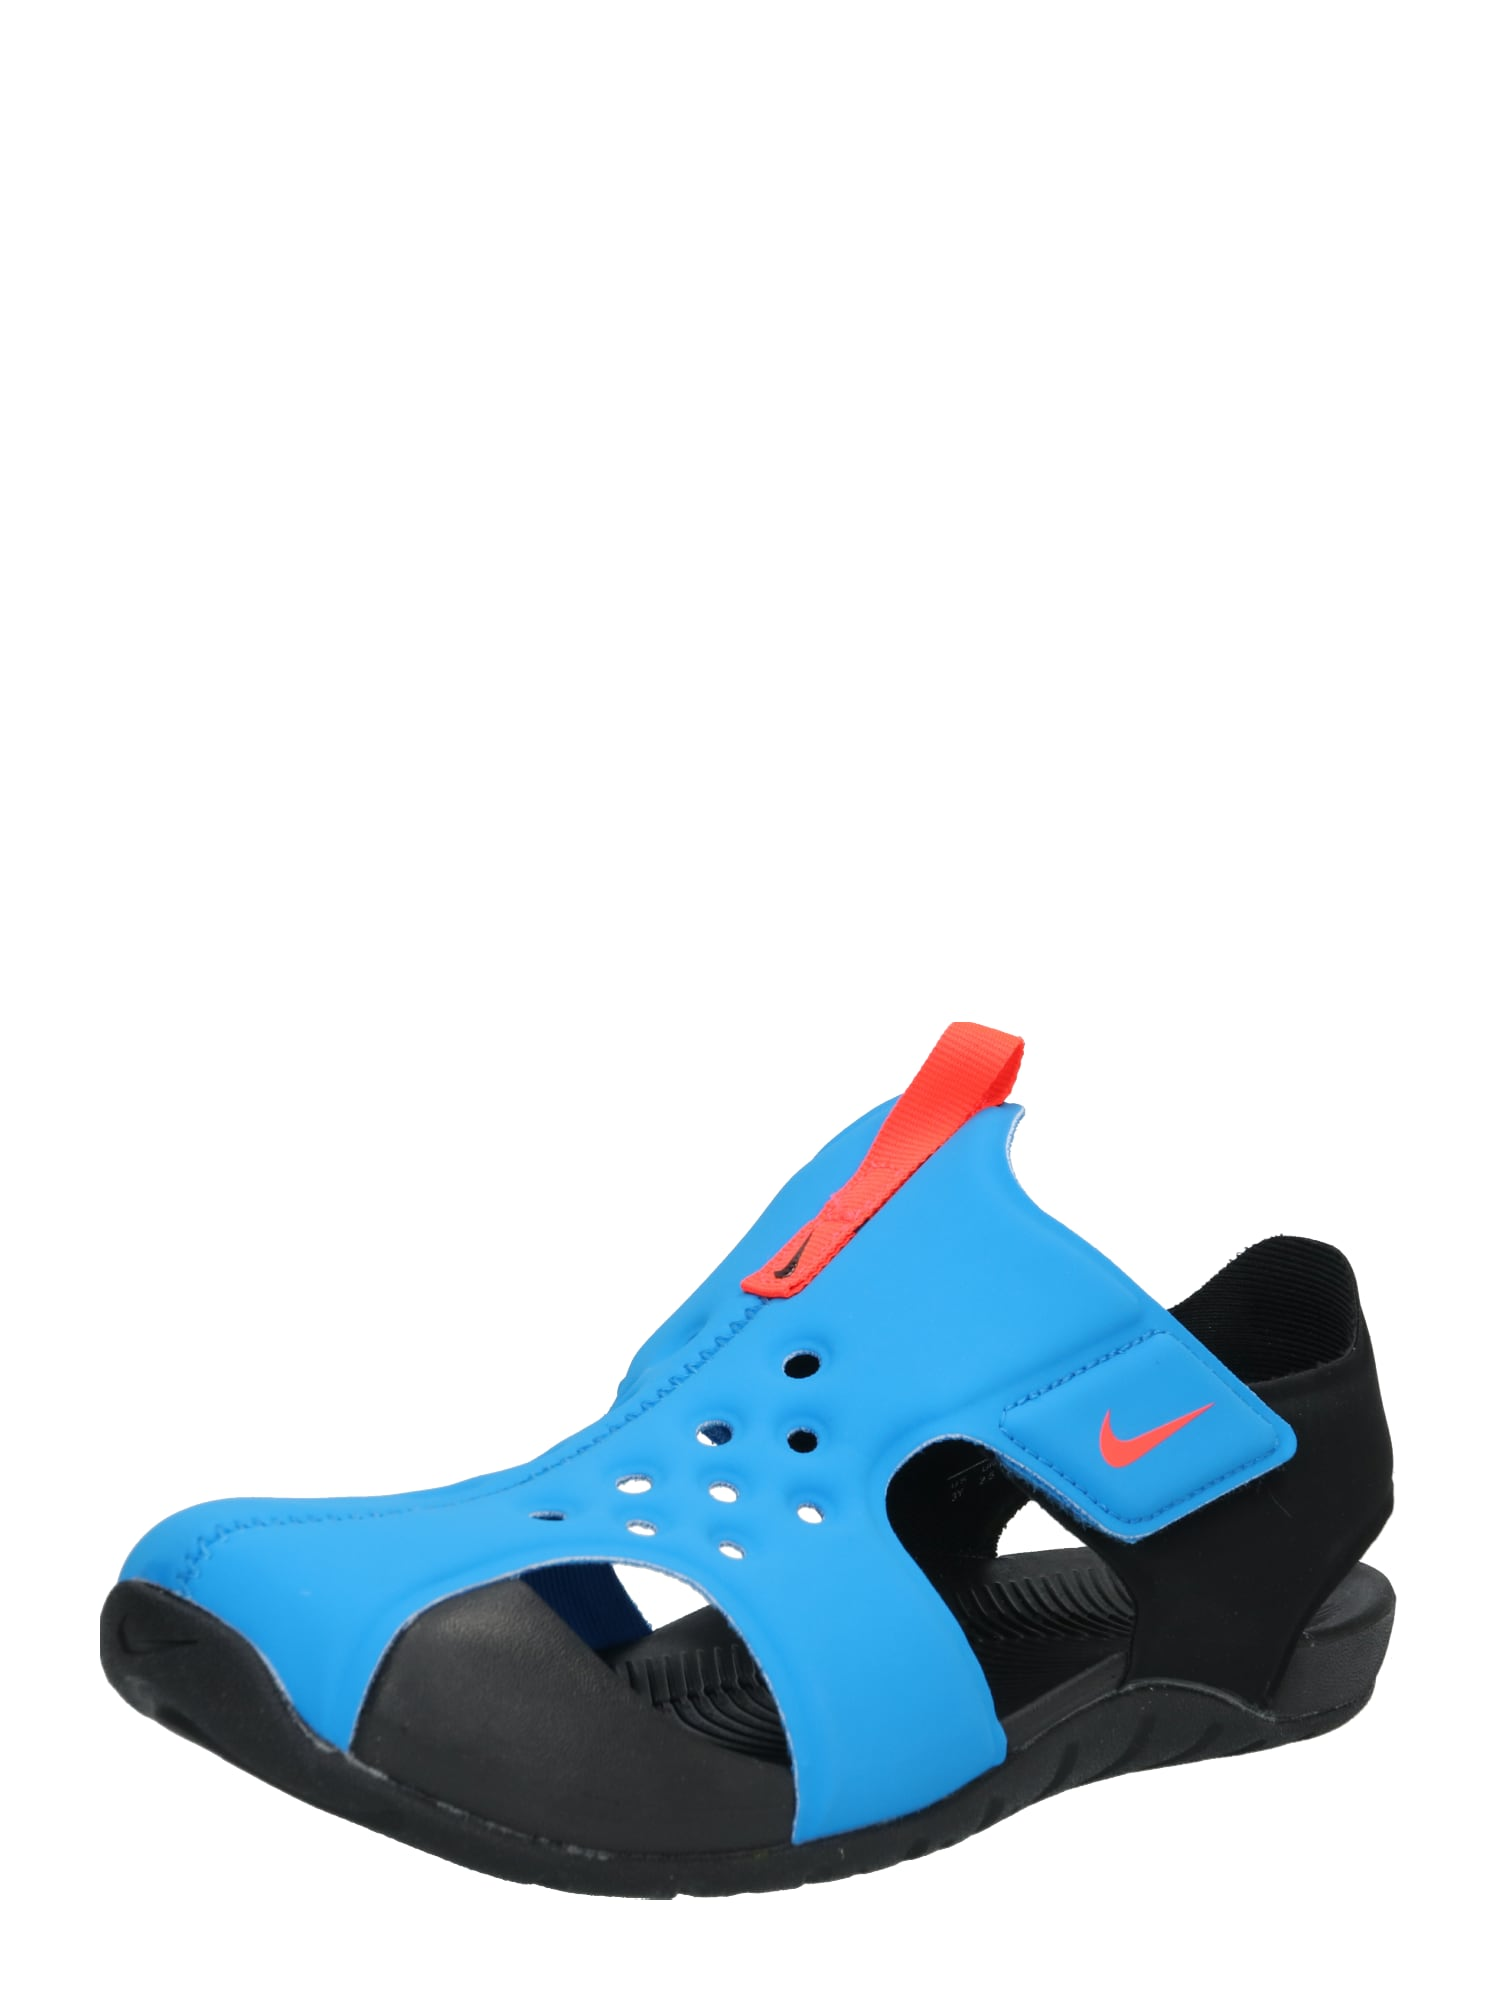 Otevřená obuv Nike Sunray Protect 2 (PS) Preschool Sandal modrá Nike Sportswear